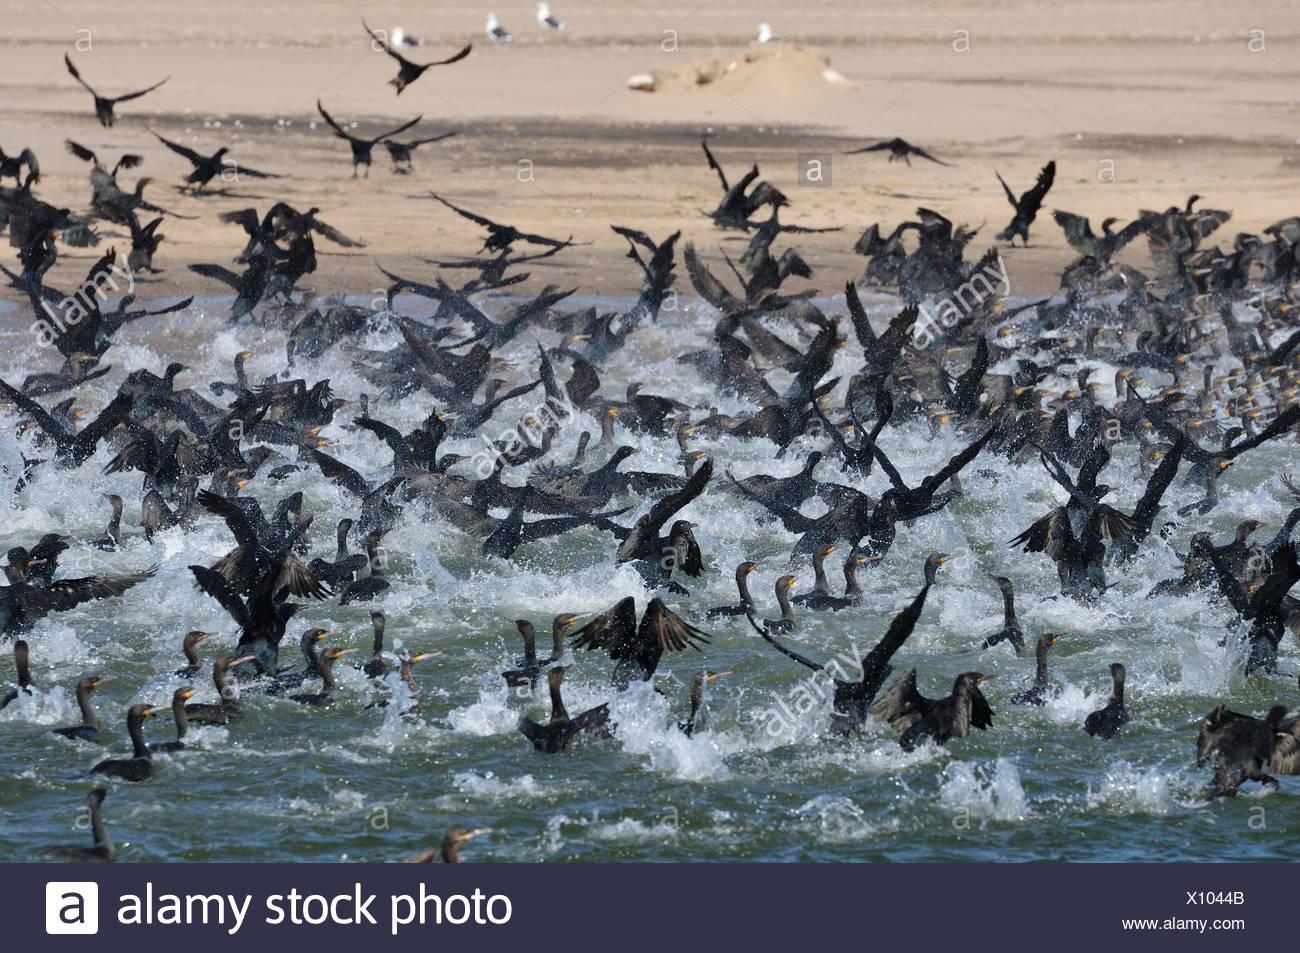 Africa, Namibia, Walvis Bay, Cormorants, Colony, birds, swarm, - Stock Image